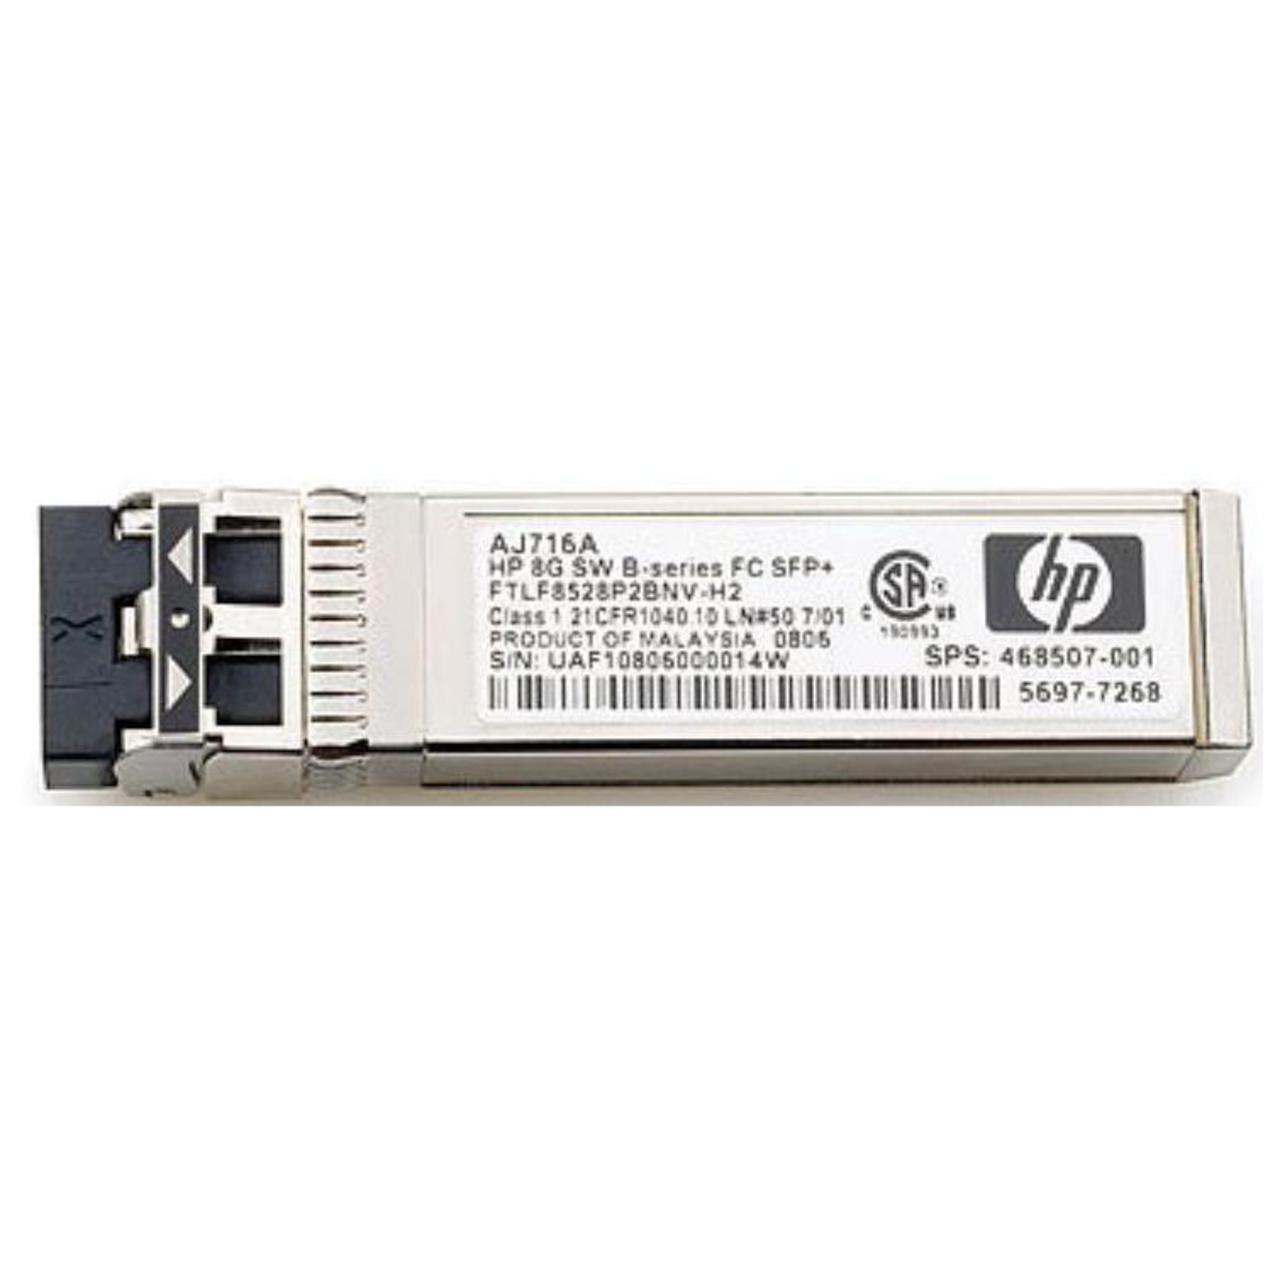 HP MSA 2040 8Gb Short Wave Fibre Channel SFP+ 4-Pack Transceiver